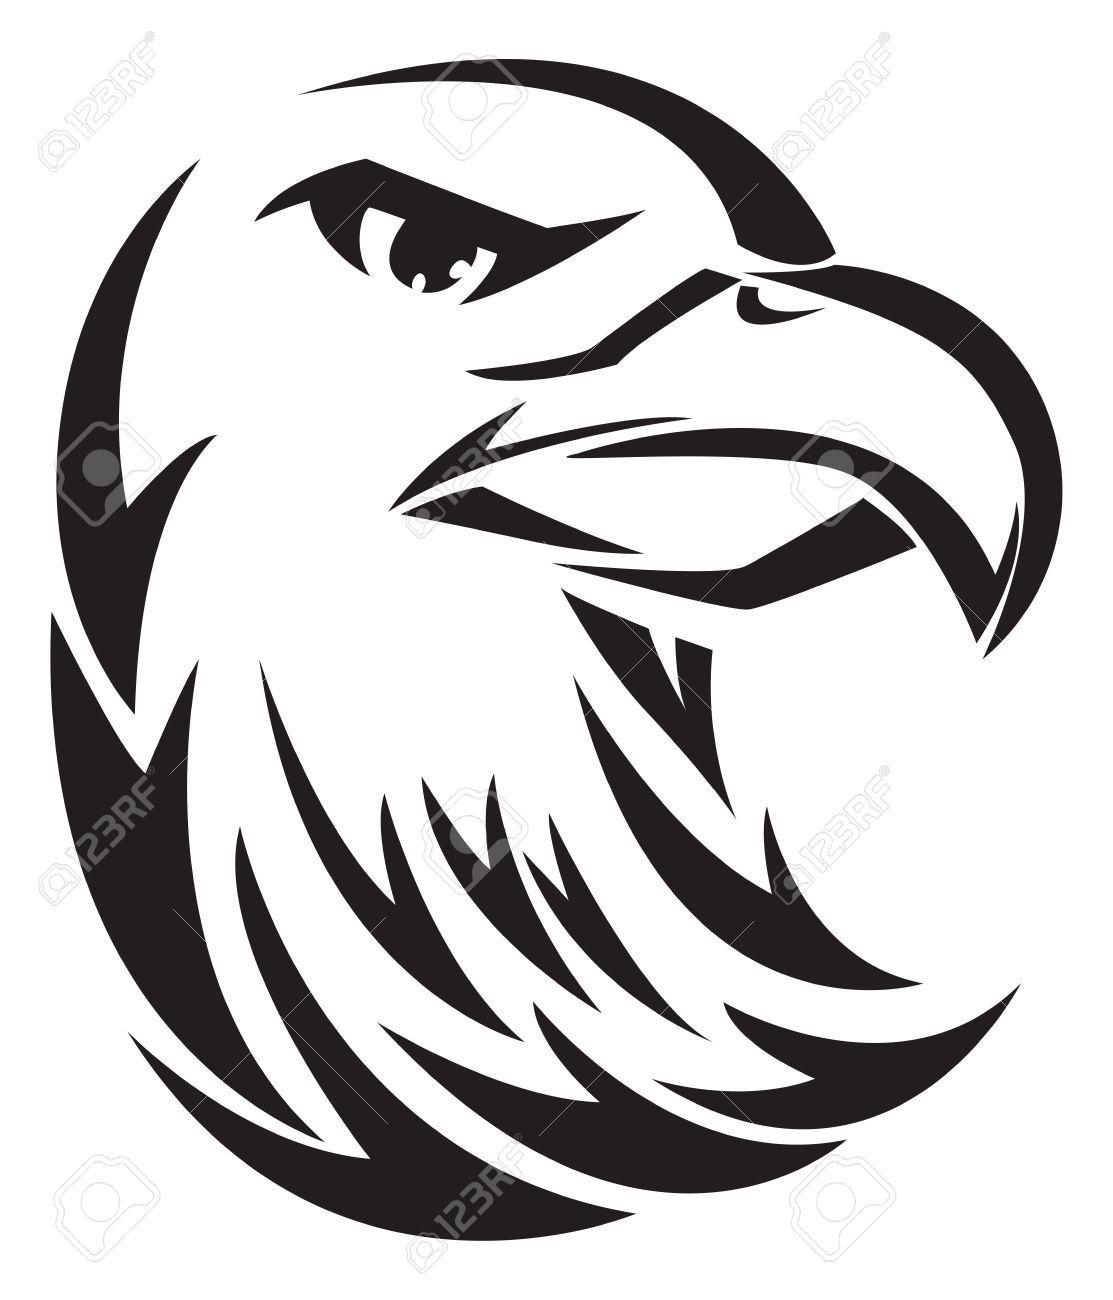 Hawk Head Stock Vector Illustration And Royalty Free Hawk